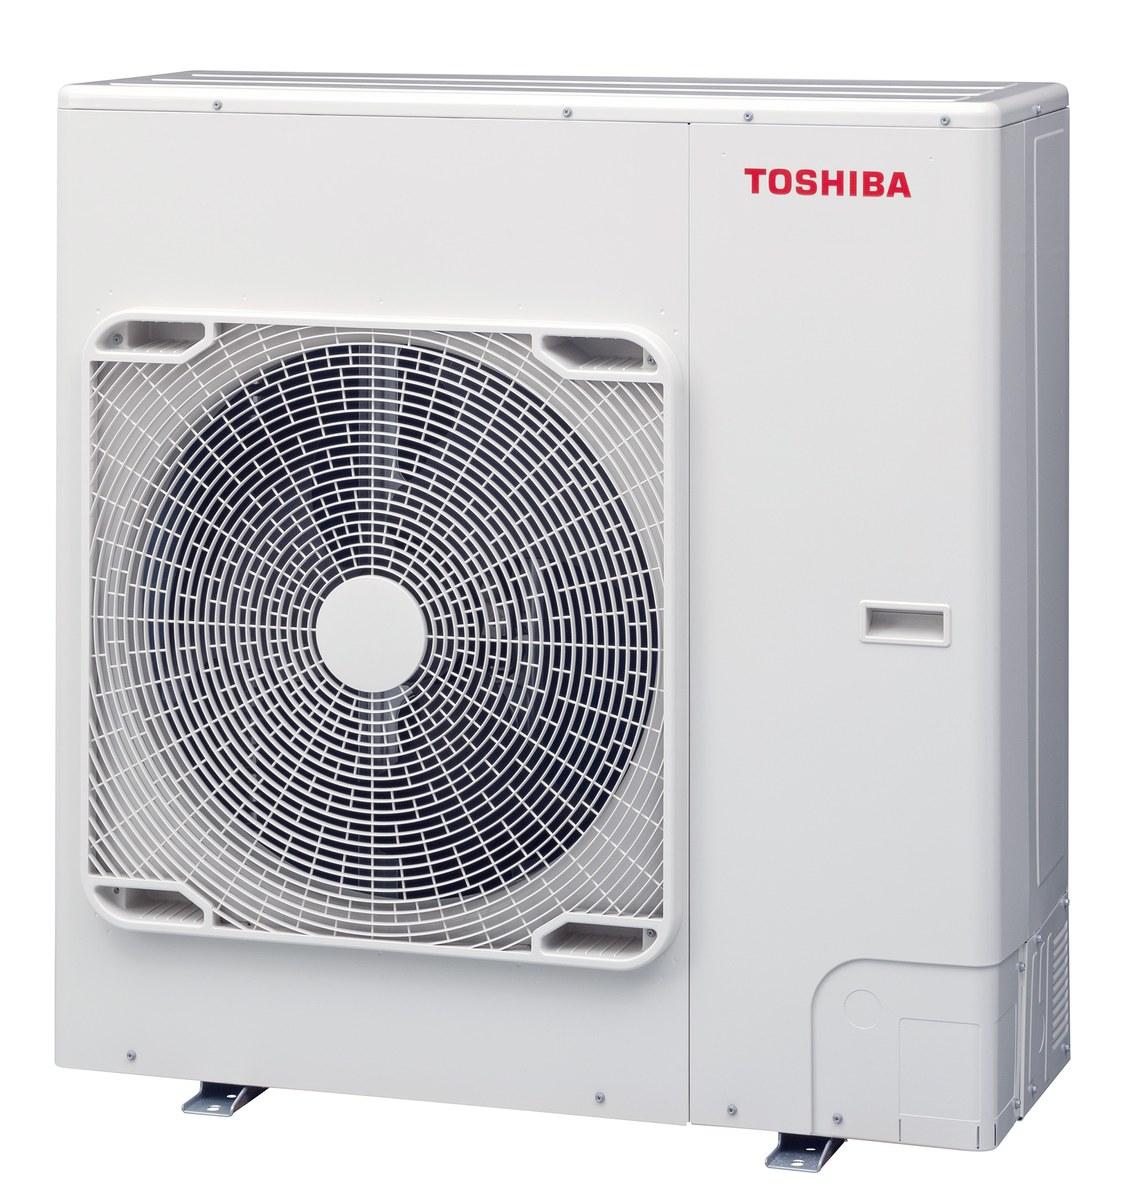 https://www.toshiba-aircon.co.uk/wp-content/uploads/2012/07/estia_80_cdu.jpg